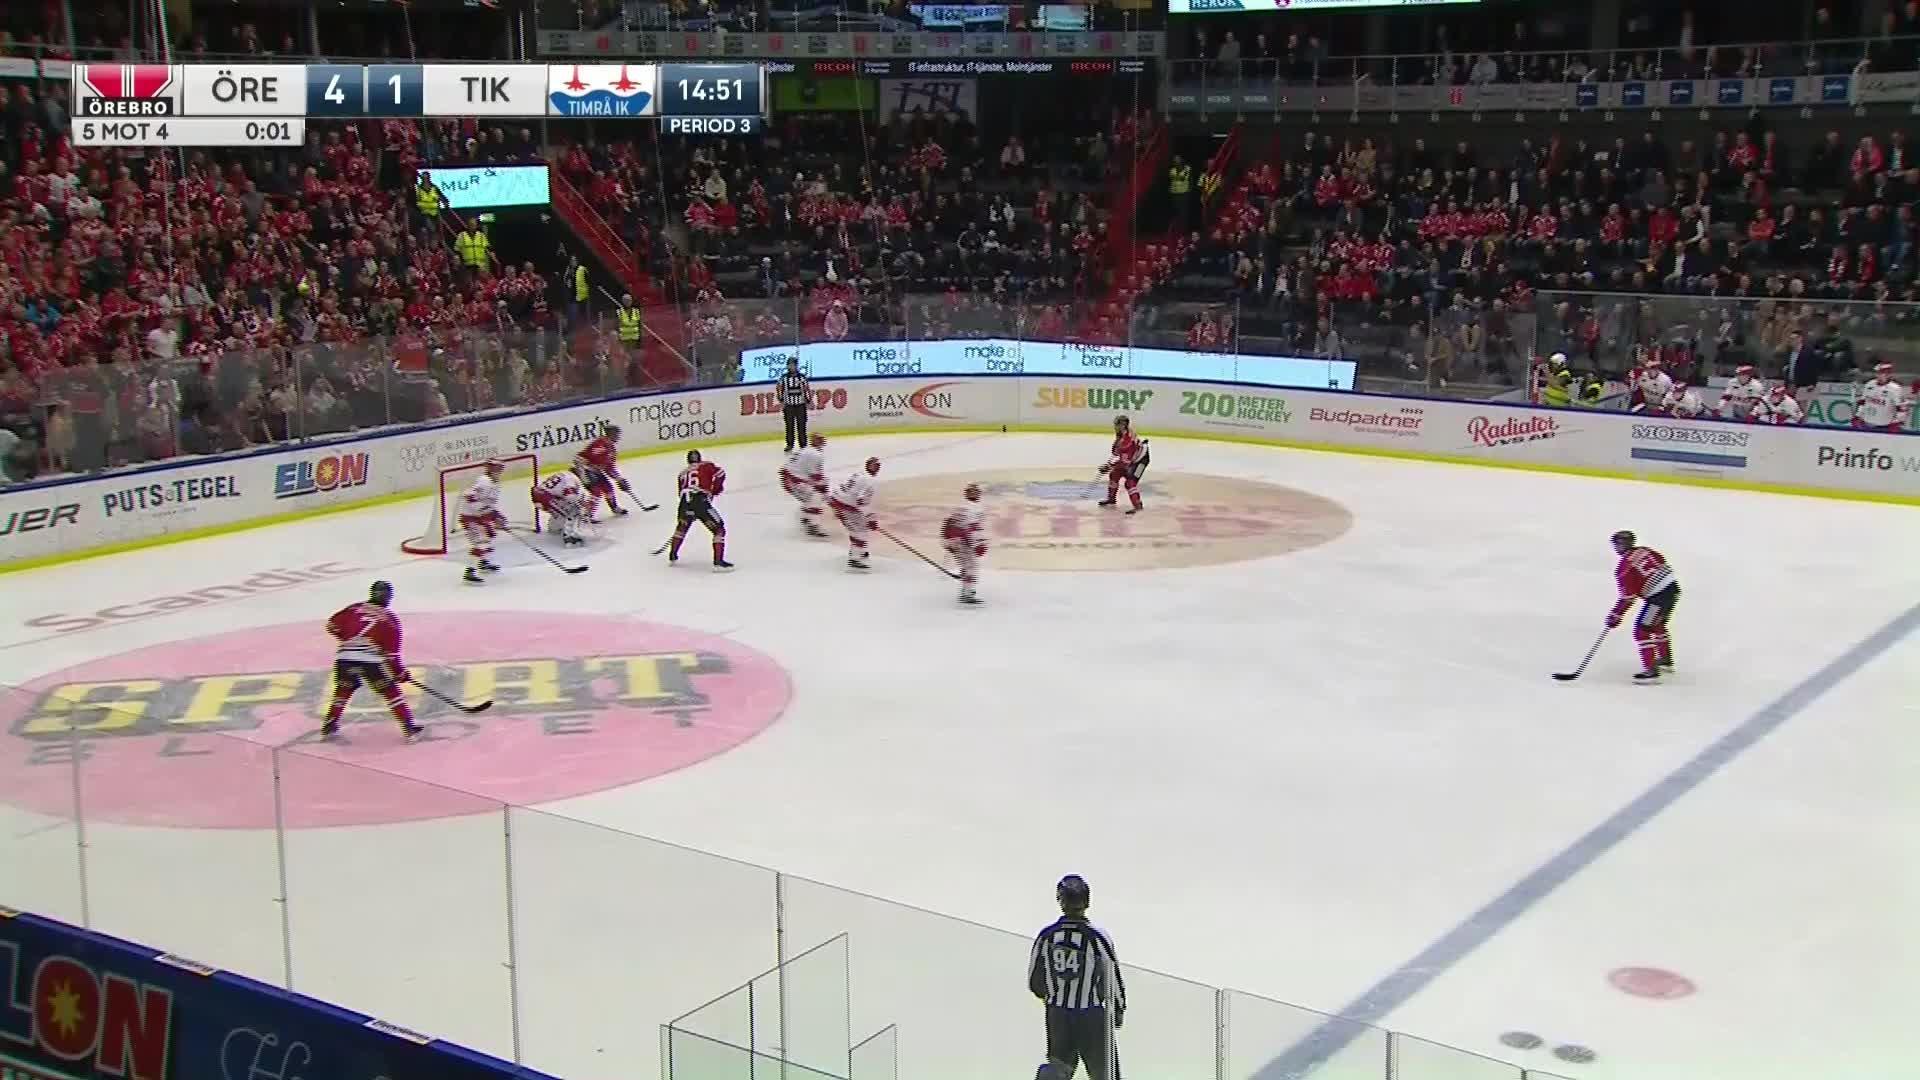 Örebro Hockey - Timrå IK 5-1